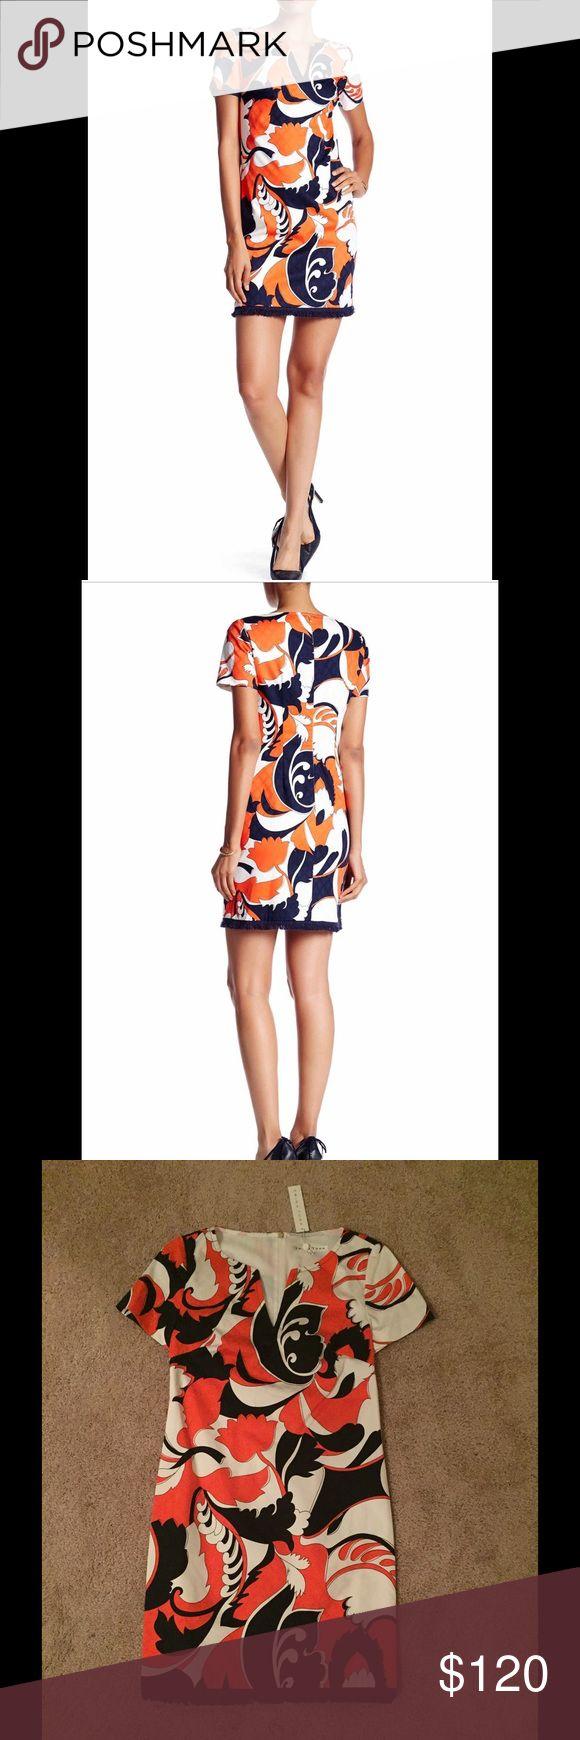 Trina Turk Coral Paisley Print Dress Split V-neck, short sleeves, back zip closure, allover paisley print, frayed hem. Made in USA. Shell: 95% cotton, 5% Lycra. Lining: 100% polyester. Dry clean. Trina Turk Dresses Mini